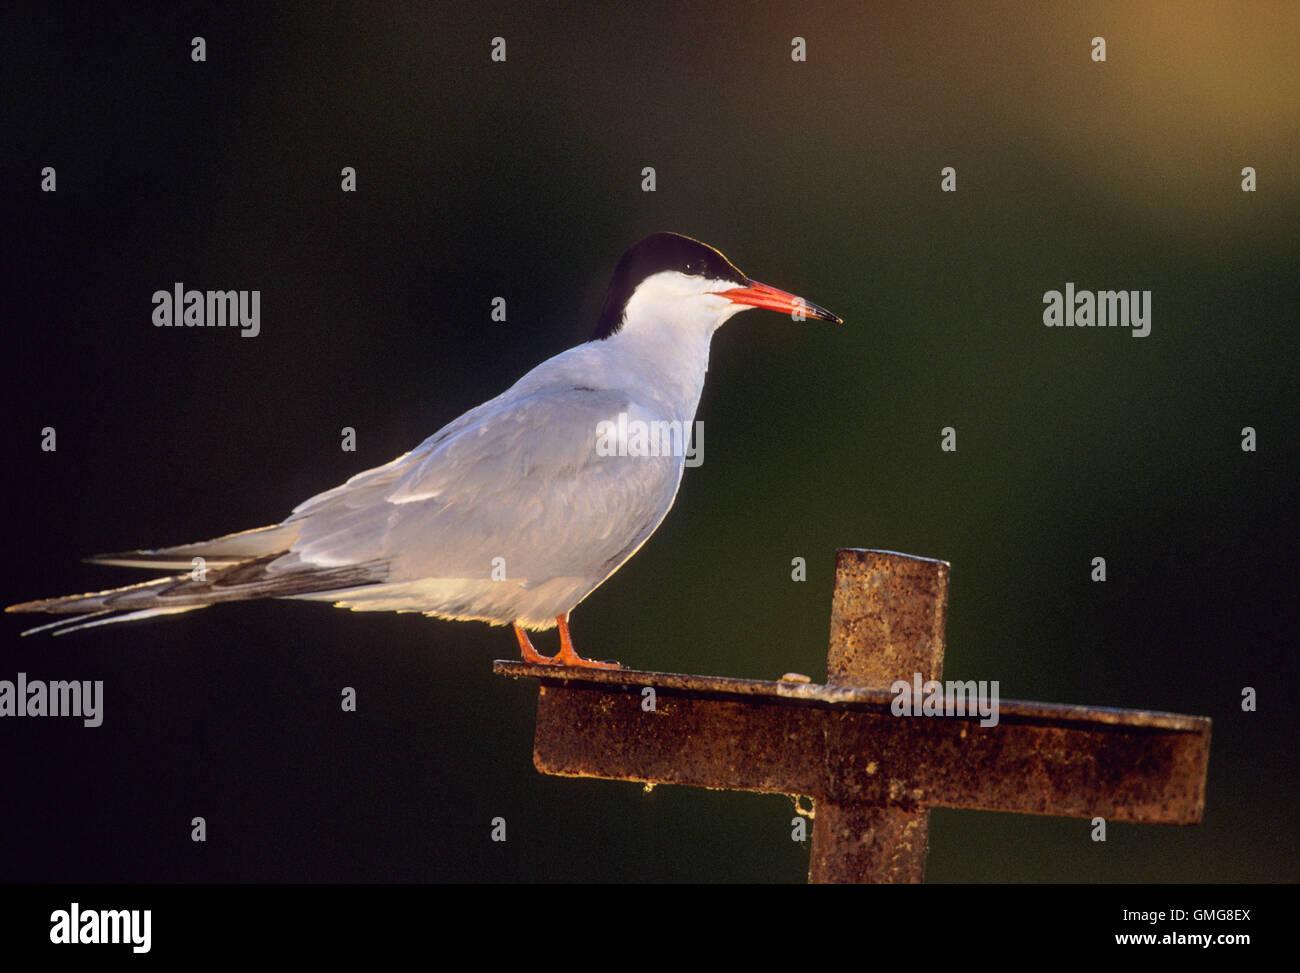 Common Tern,Sterna Hirundo, with summer plumage, Hampstead Heath ponds, London, Great Britain - Stock Image